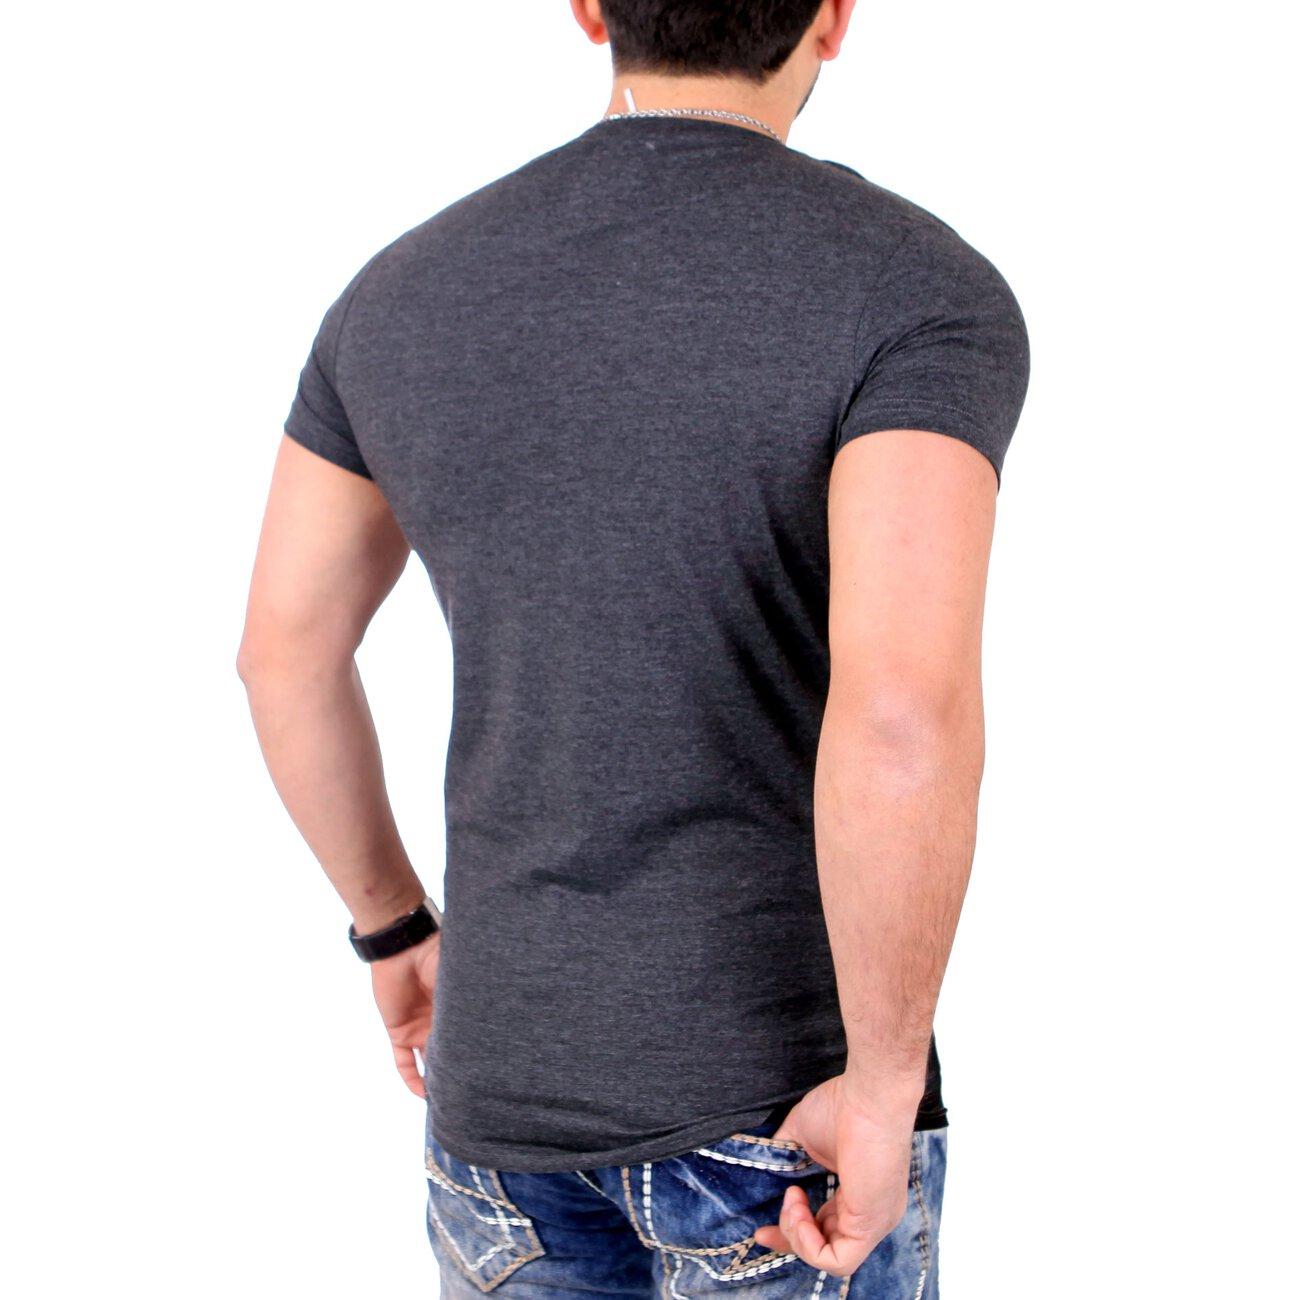 reslad t shirt rundhals long style shirt casual wear. Black Bedroom Furniture Sets. Home Design Ideas